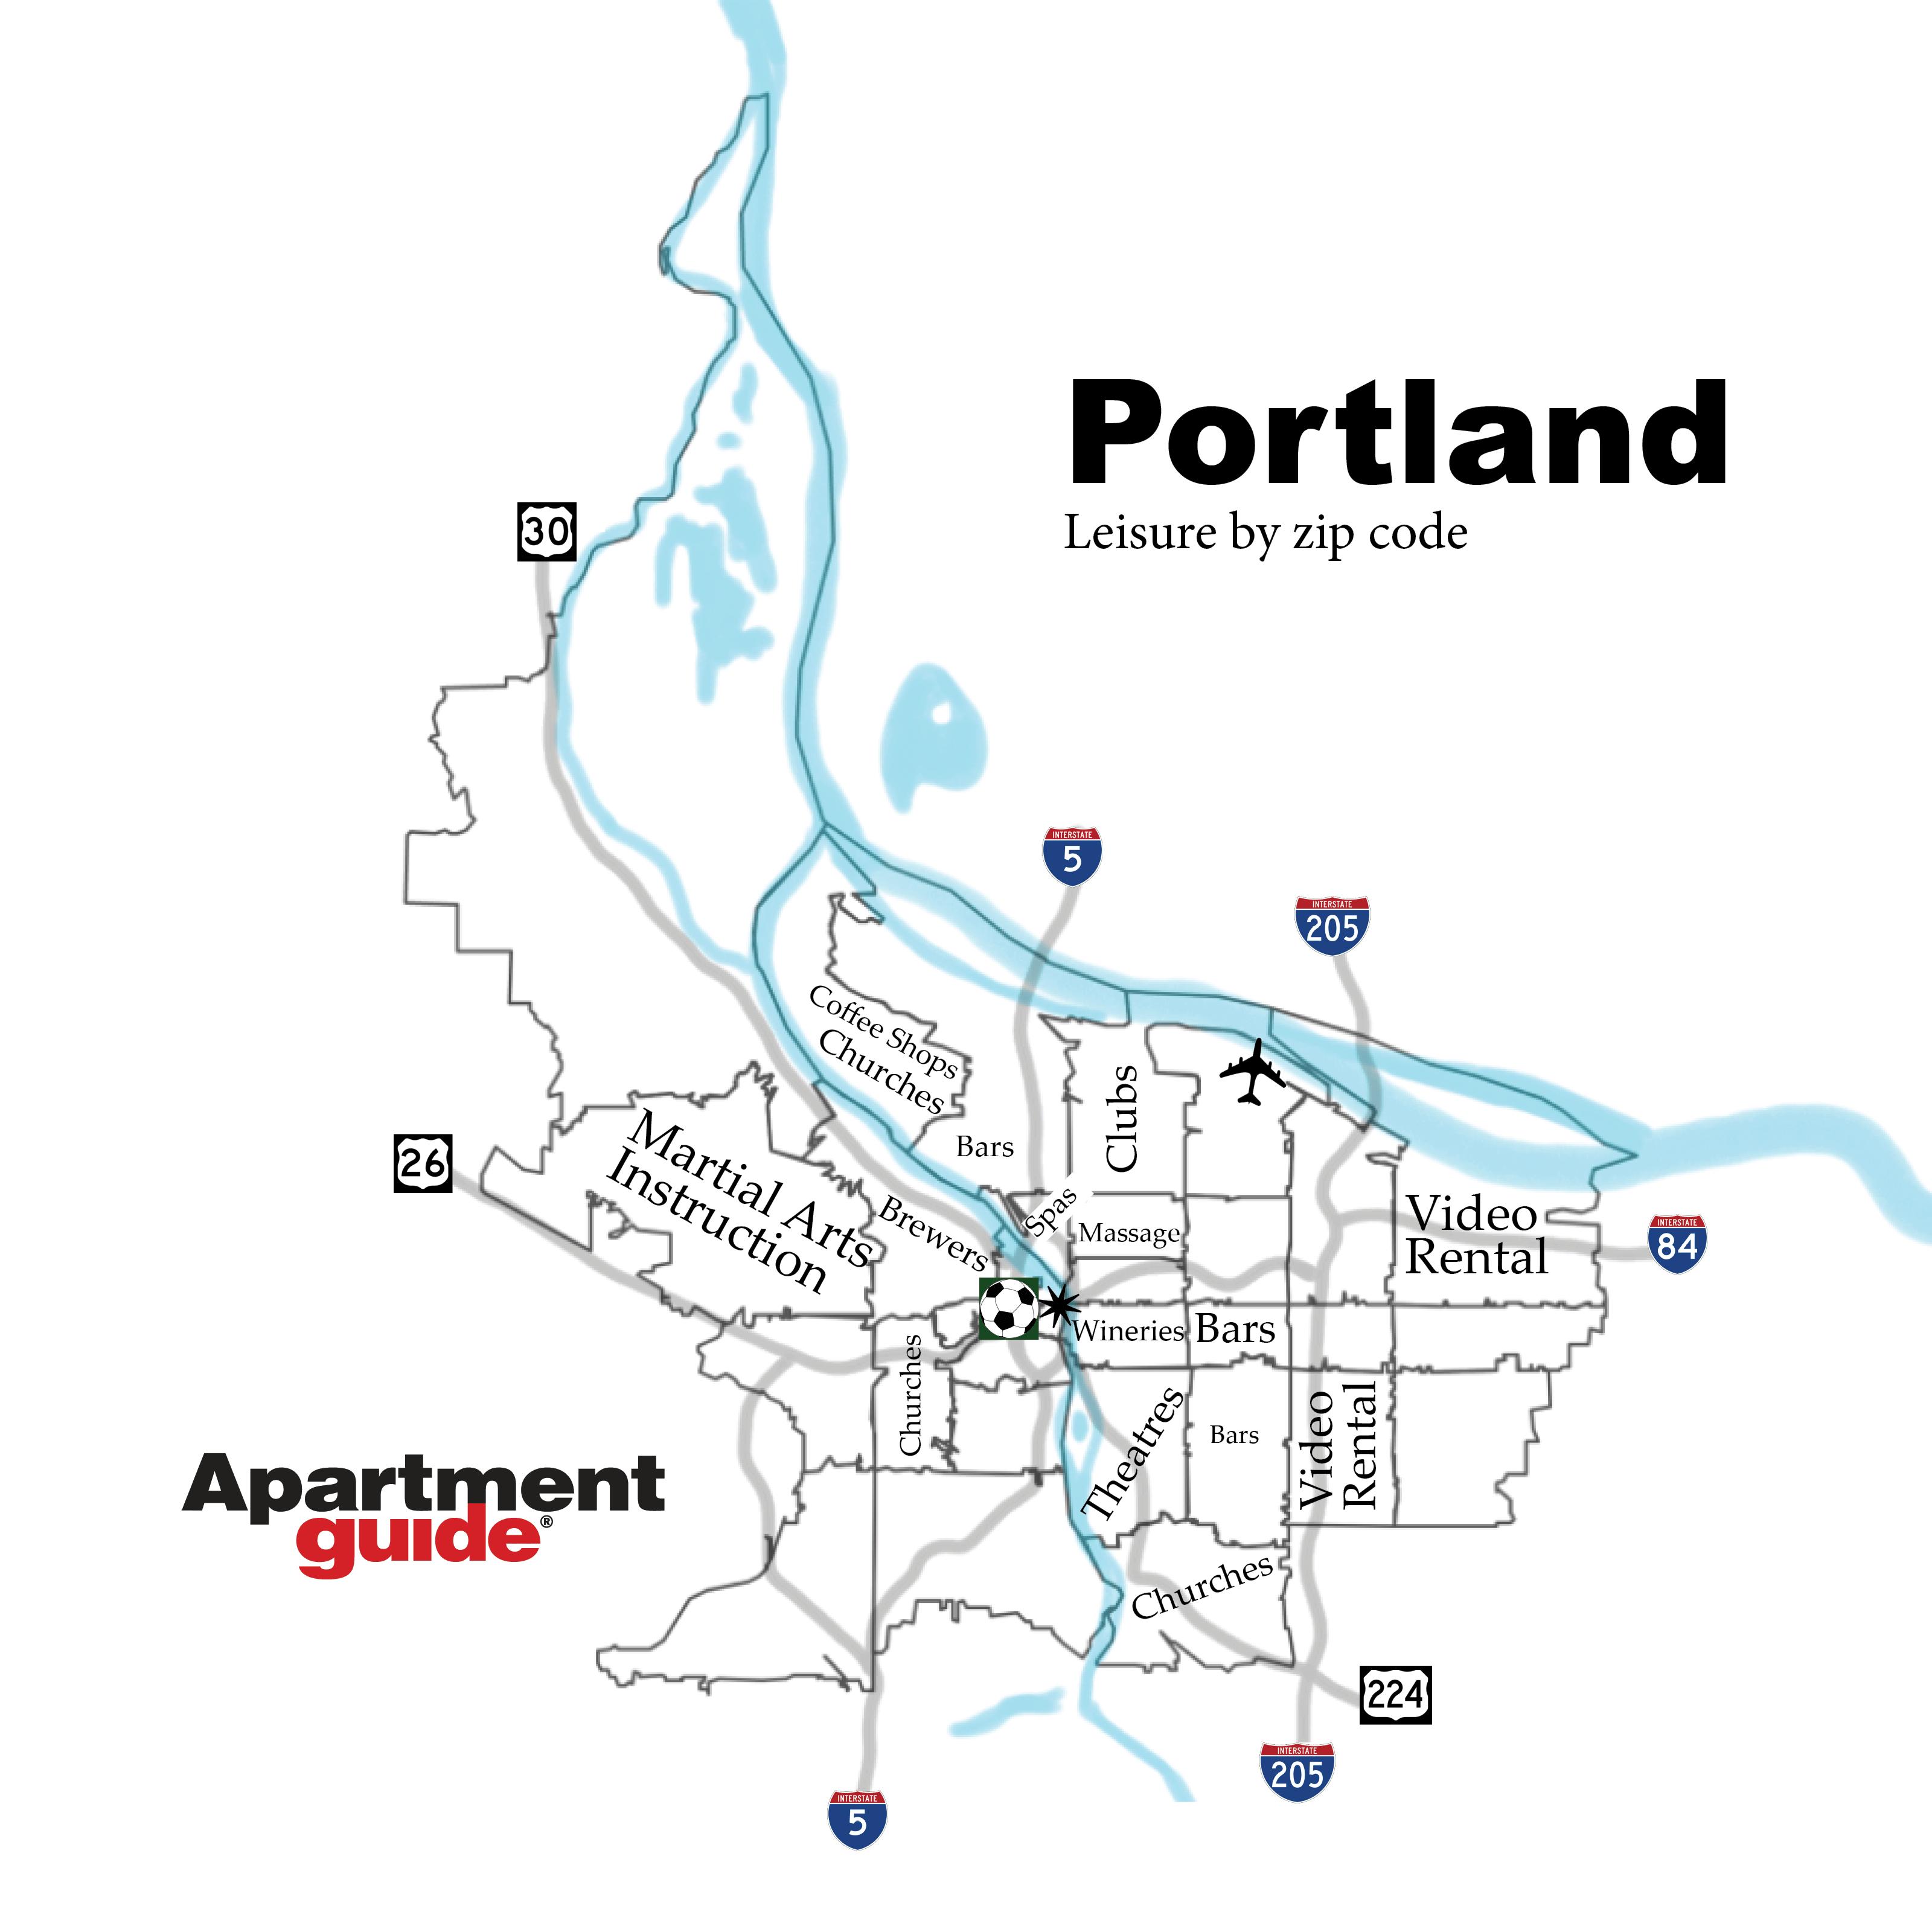 Portland leisure by zip code